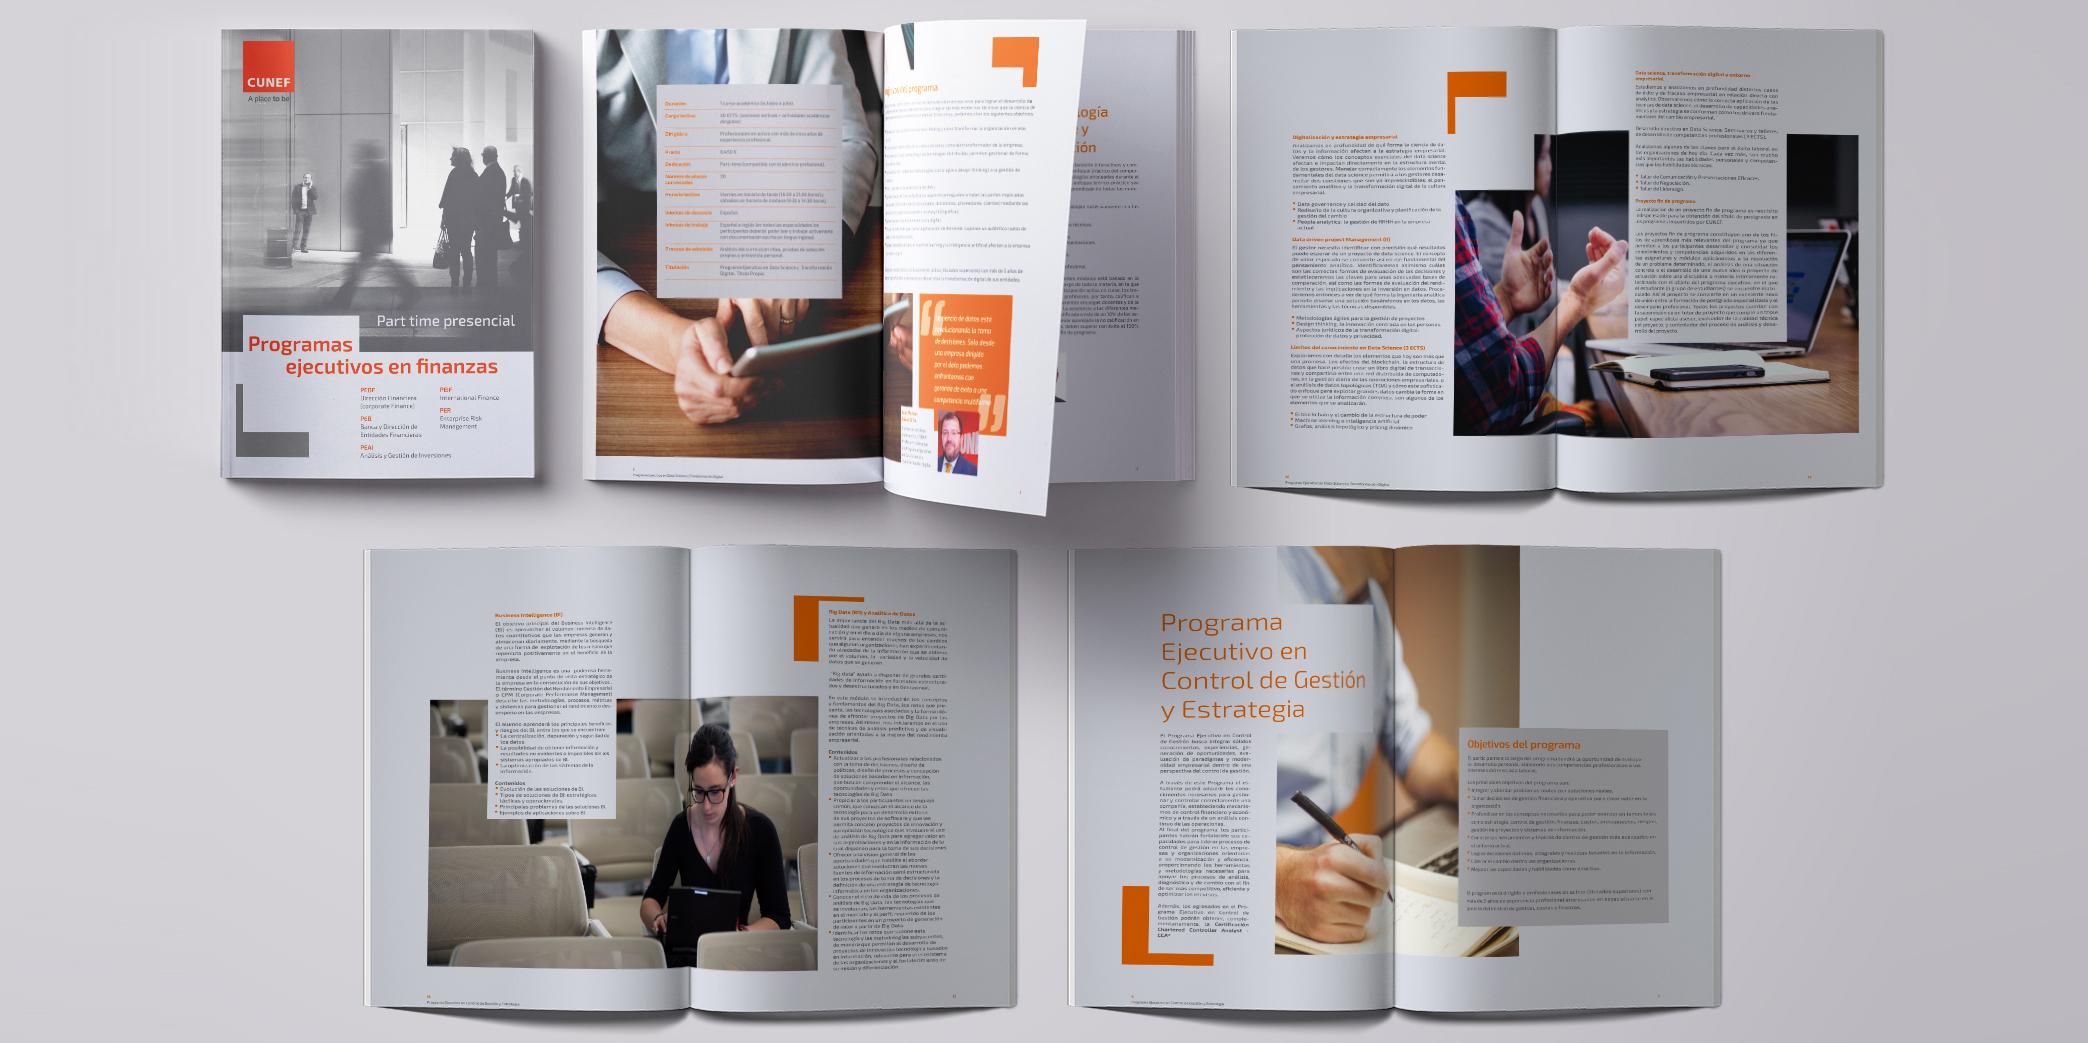 folletos cunef 1.jpg